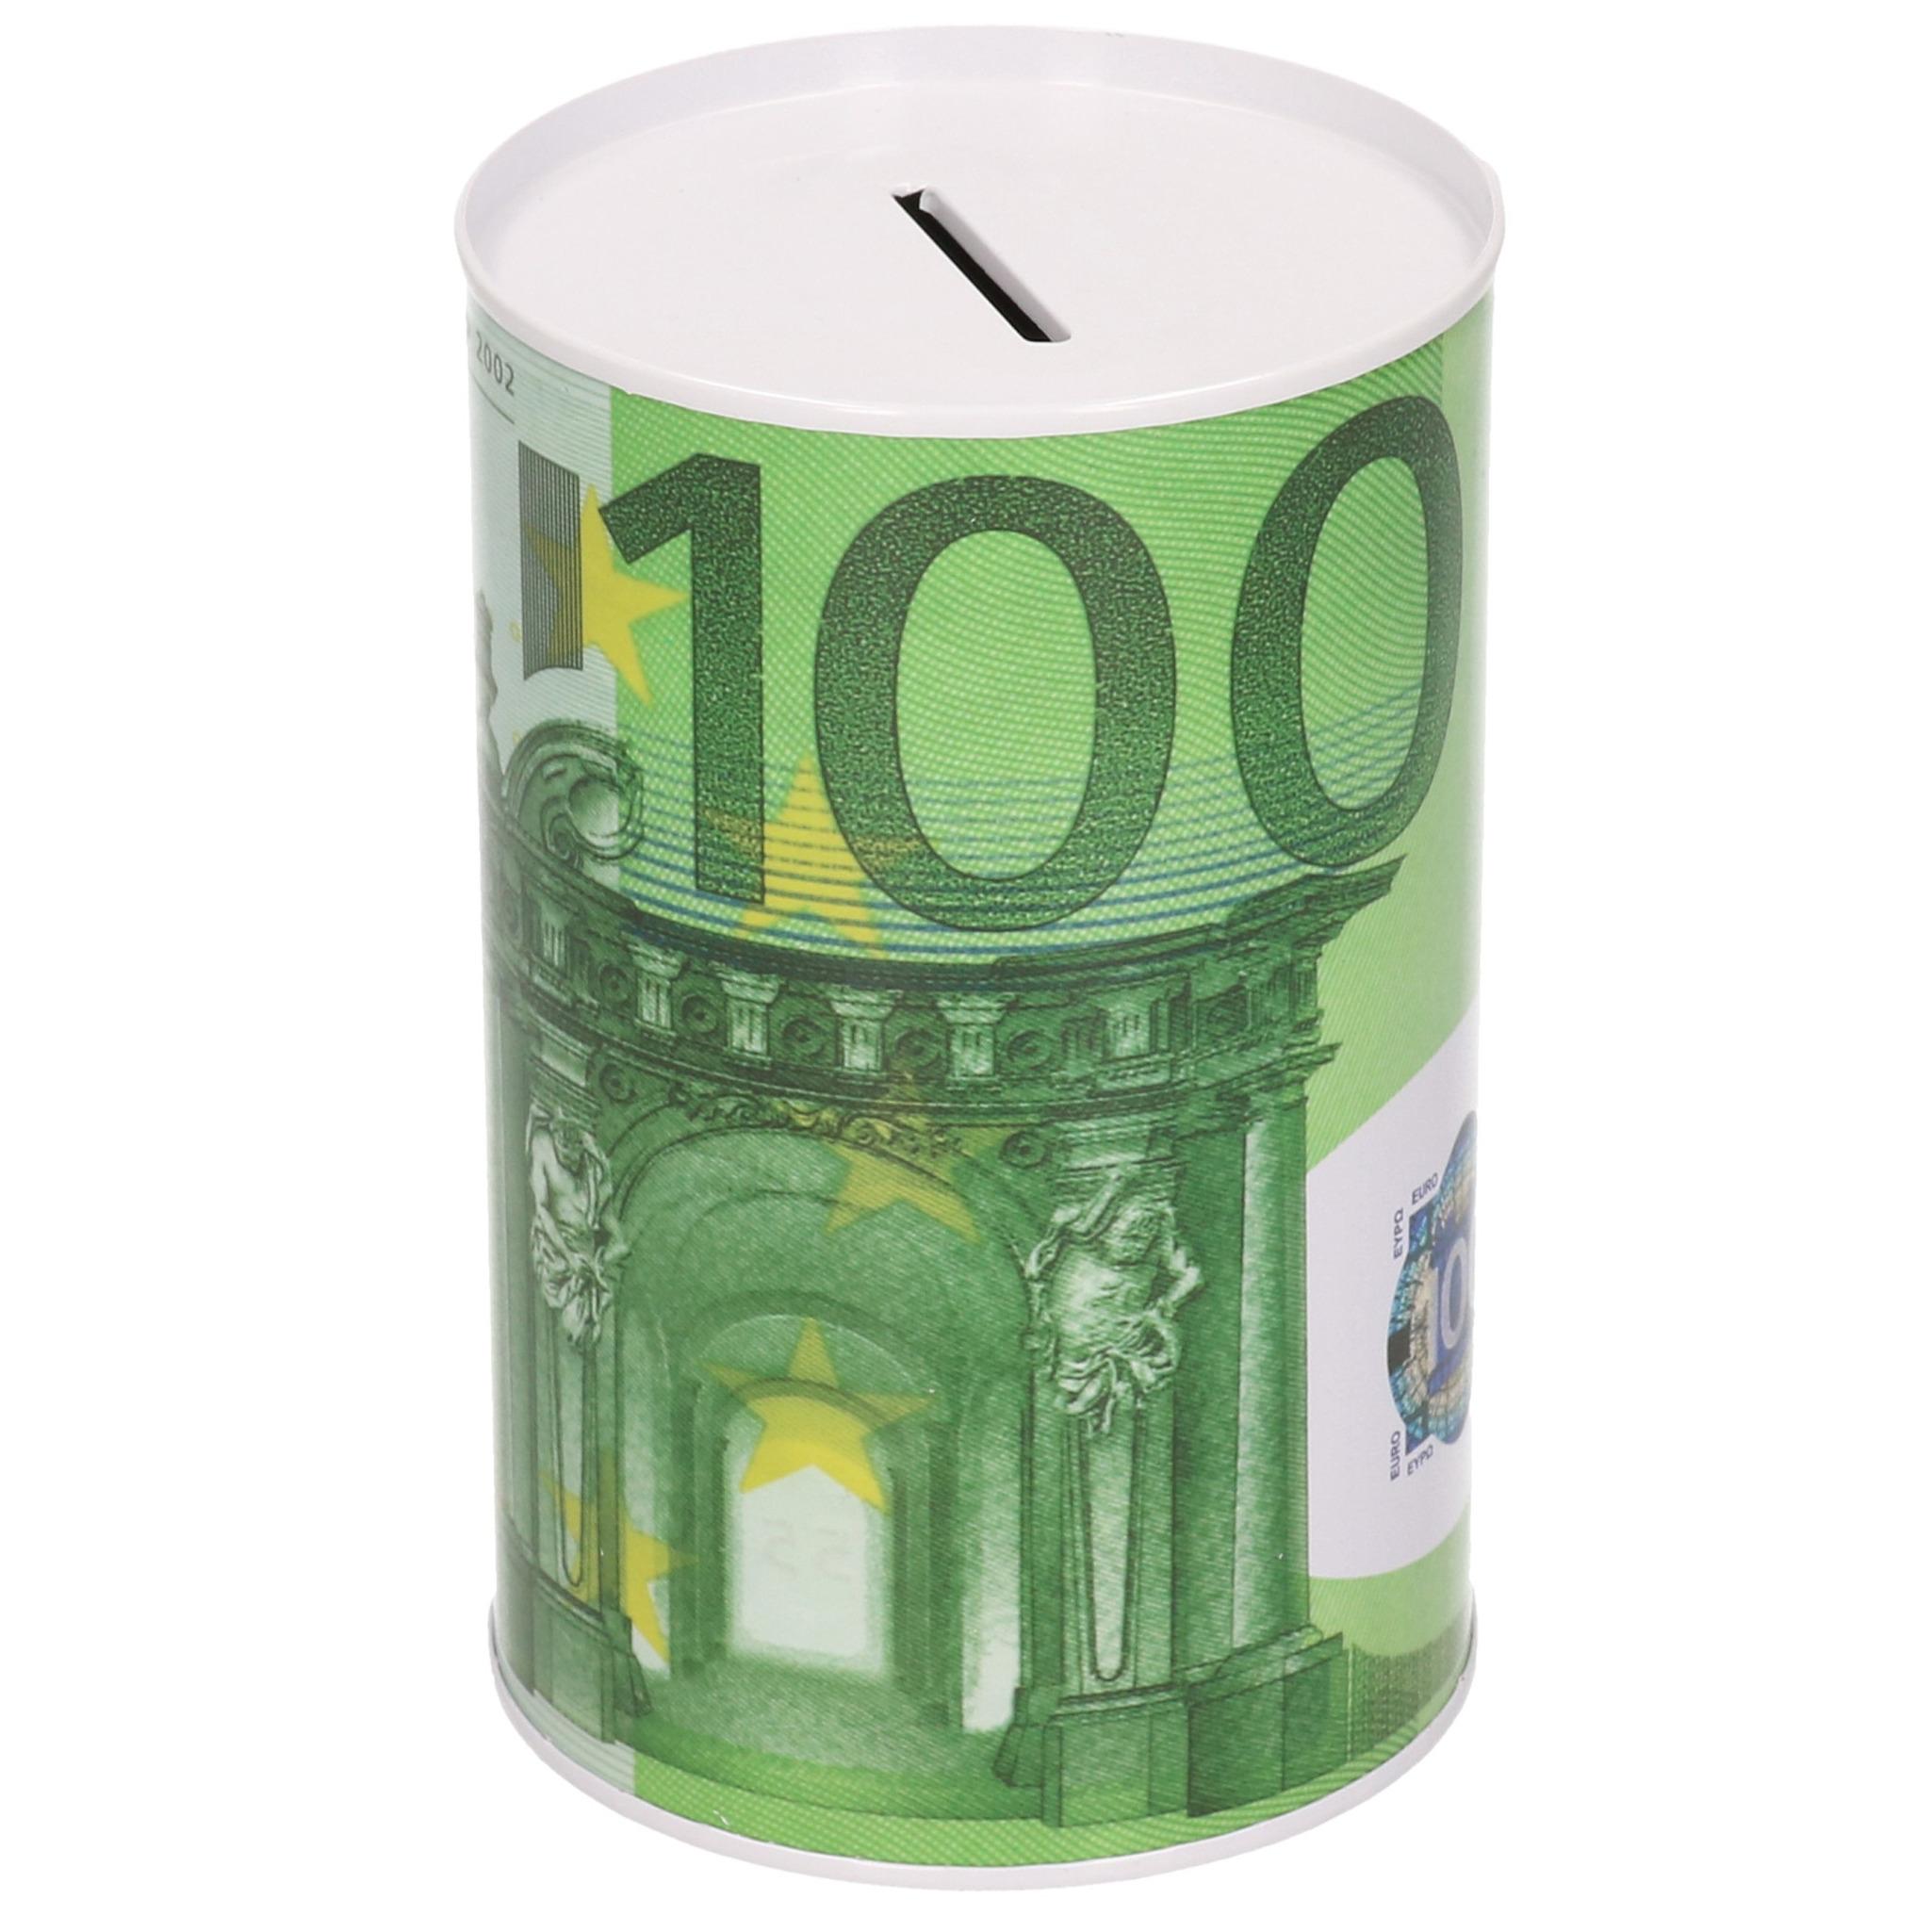 Spaarpot blik 100 euro biljet 8 x 15 cm